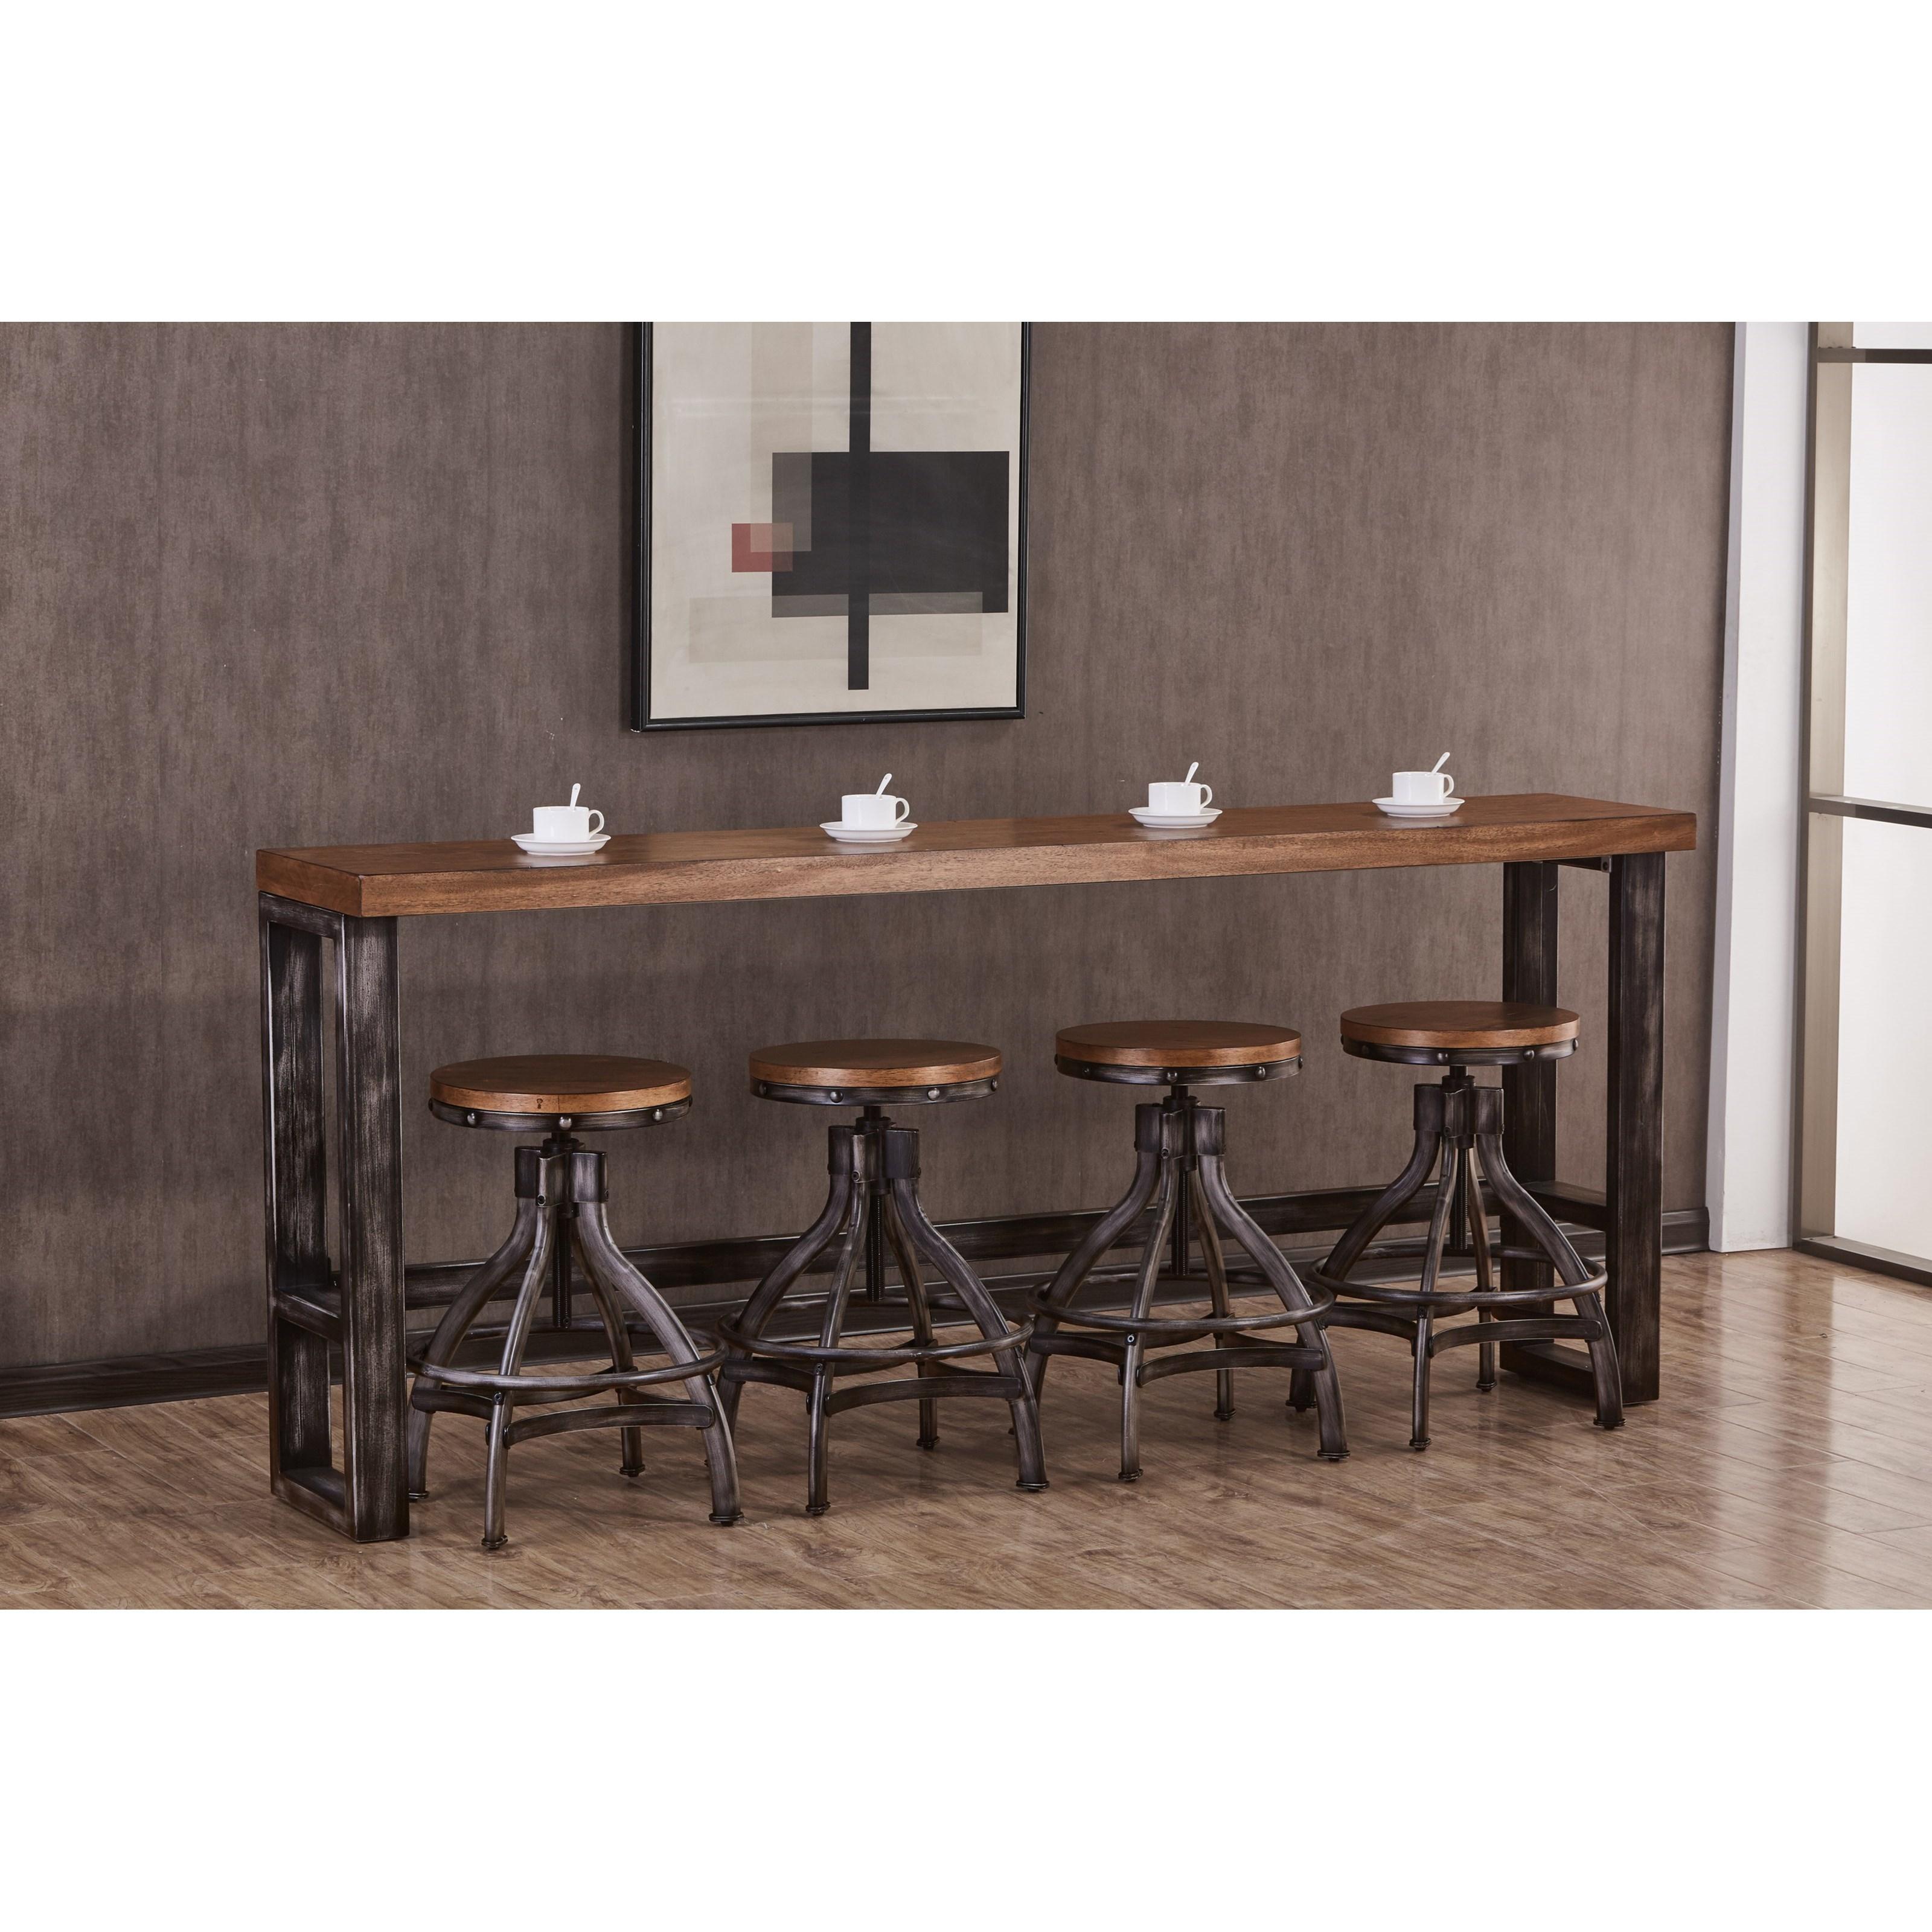 7326 Sofa Bar Table by United Furniture Industries at Bullard Furniture